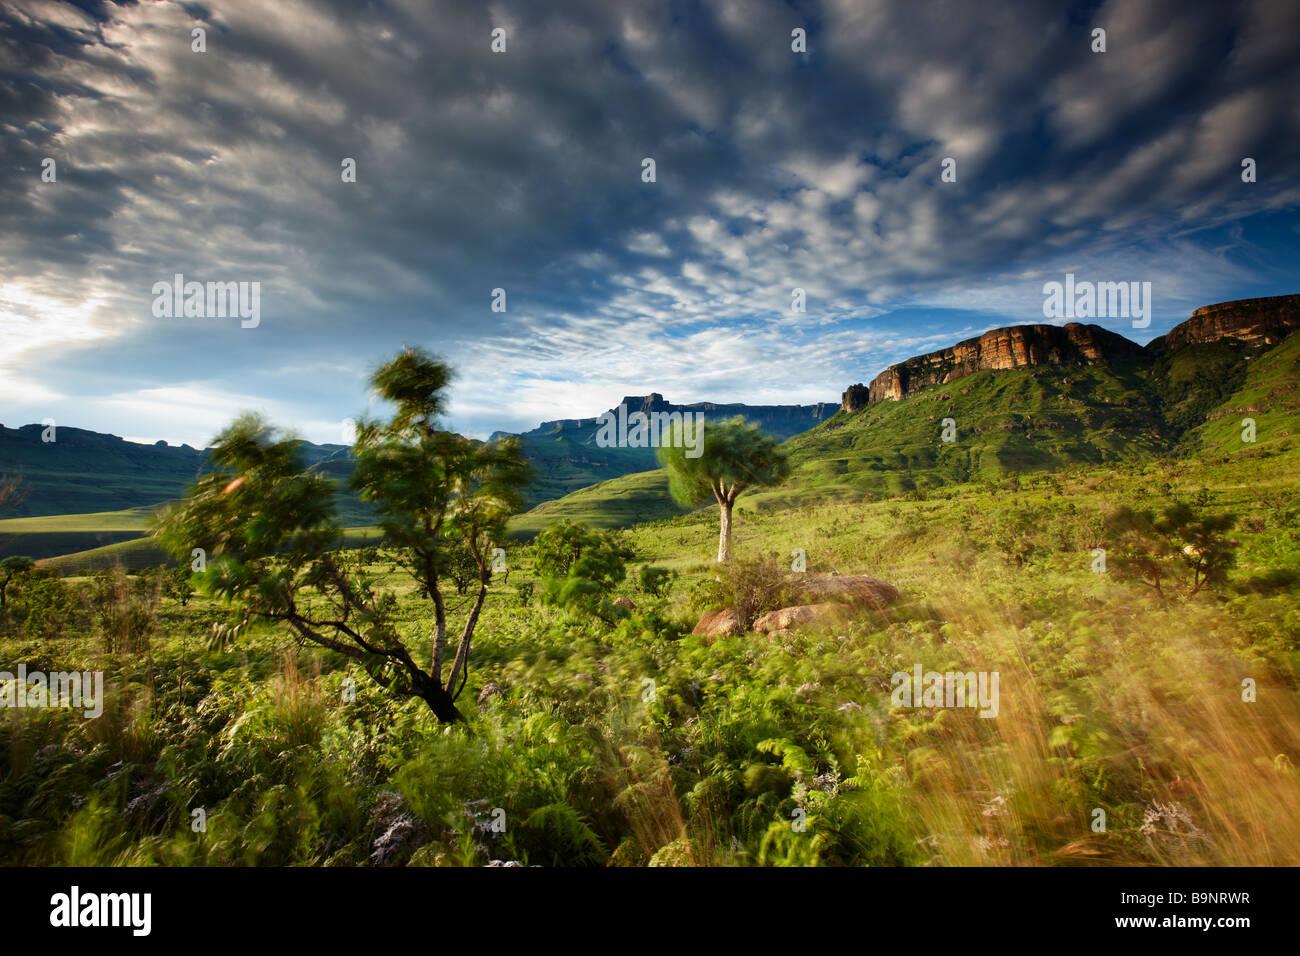 the Ampitheatre, Royal Natal National Park, Drakensberg Mountains, KwaZulu Natal, South Africa - Stock Image